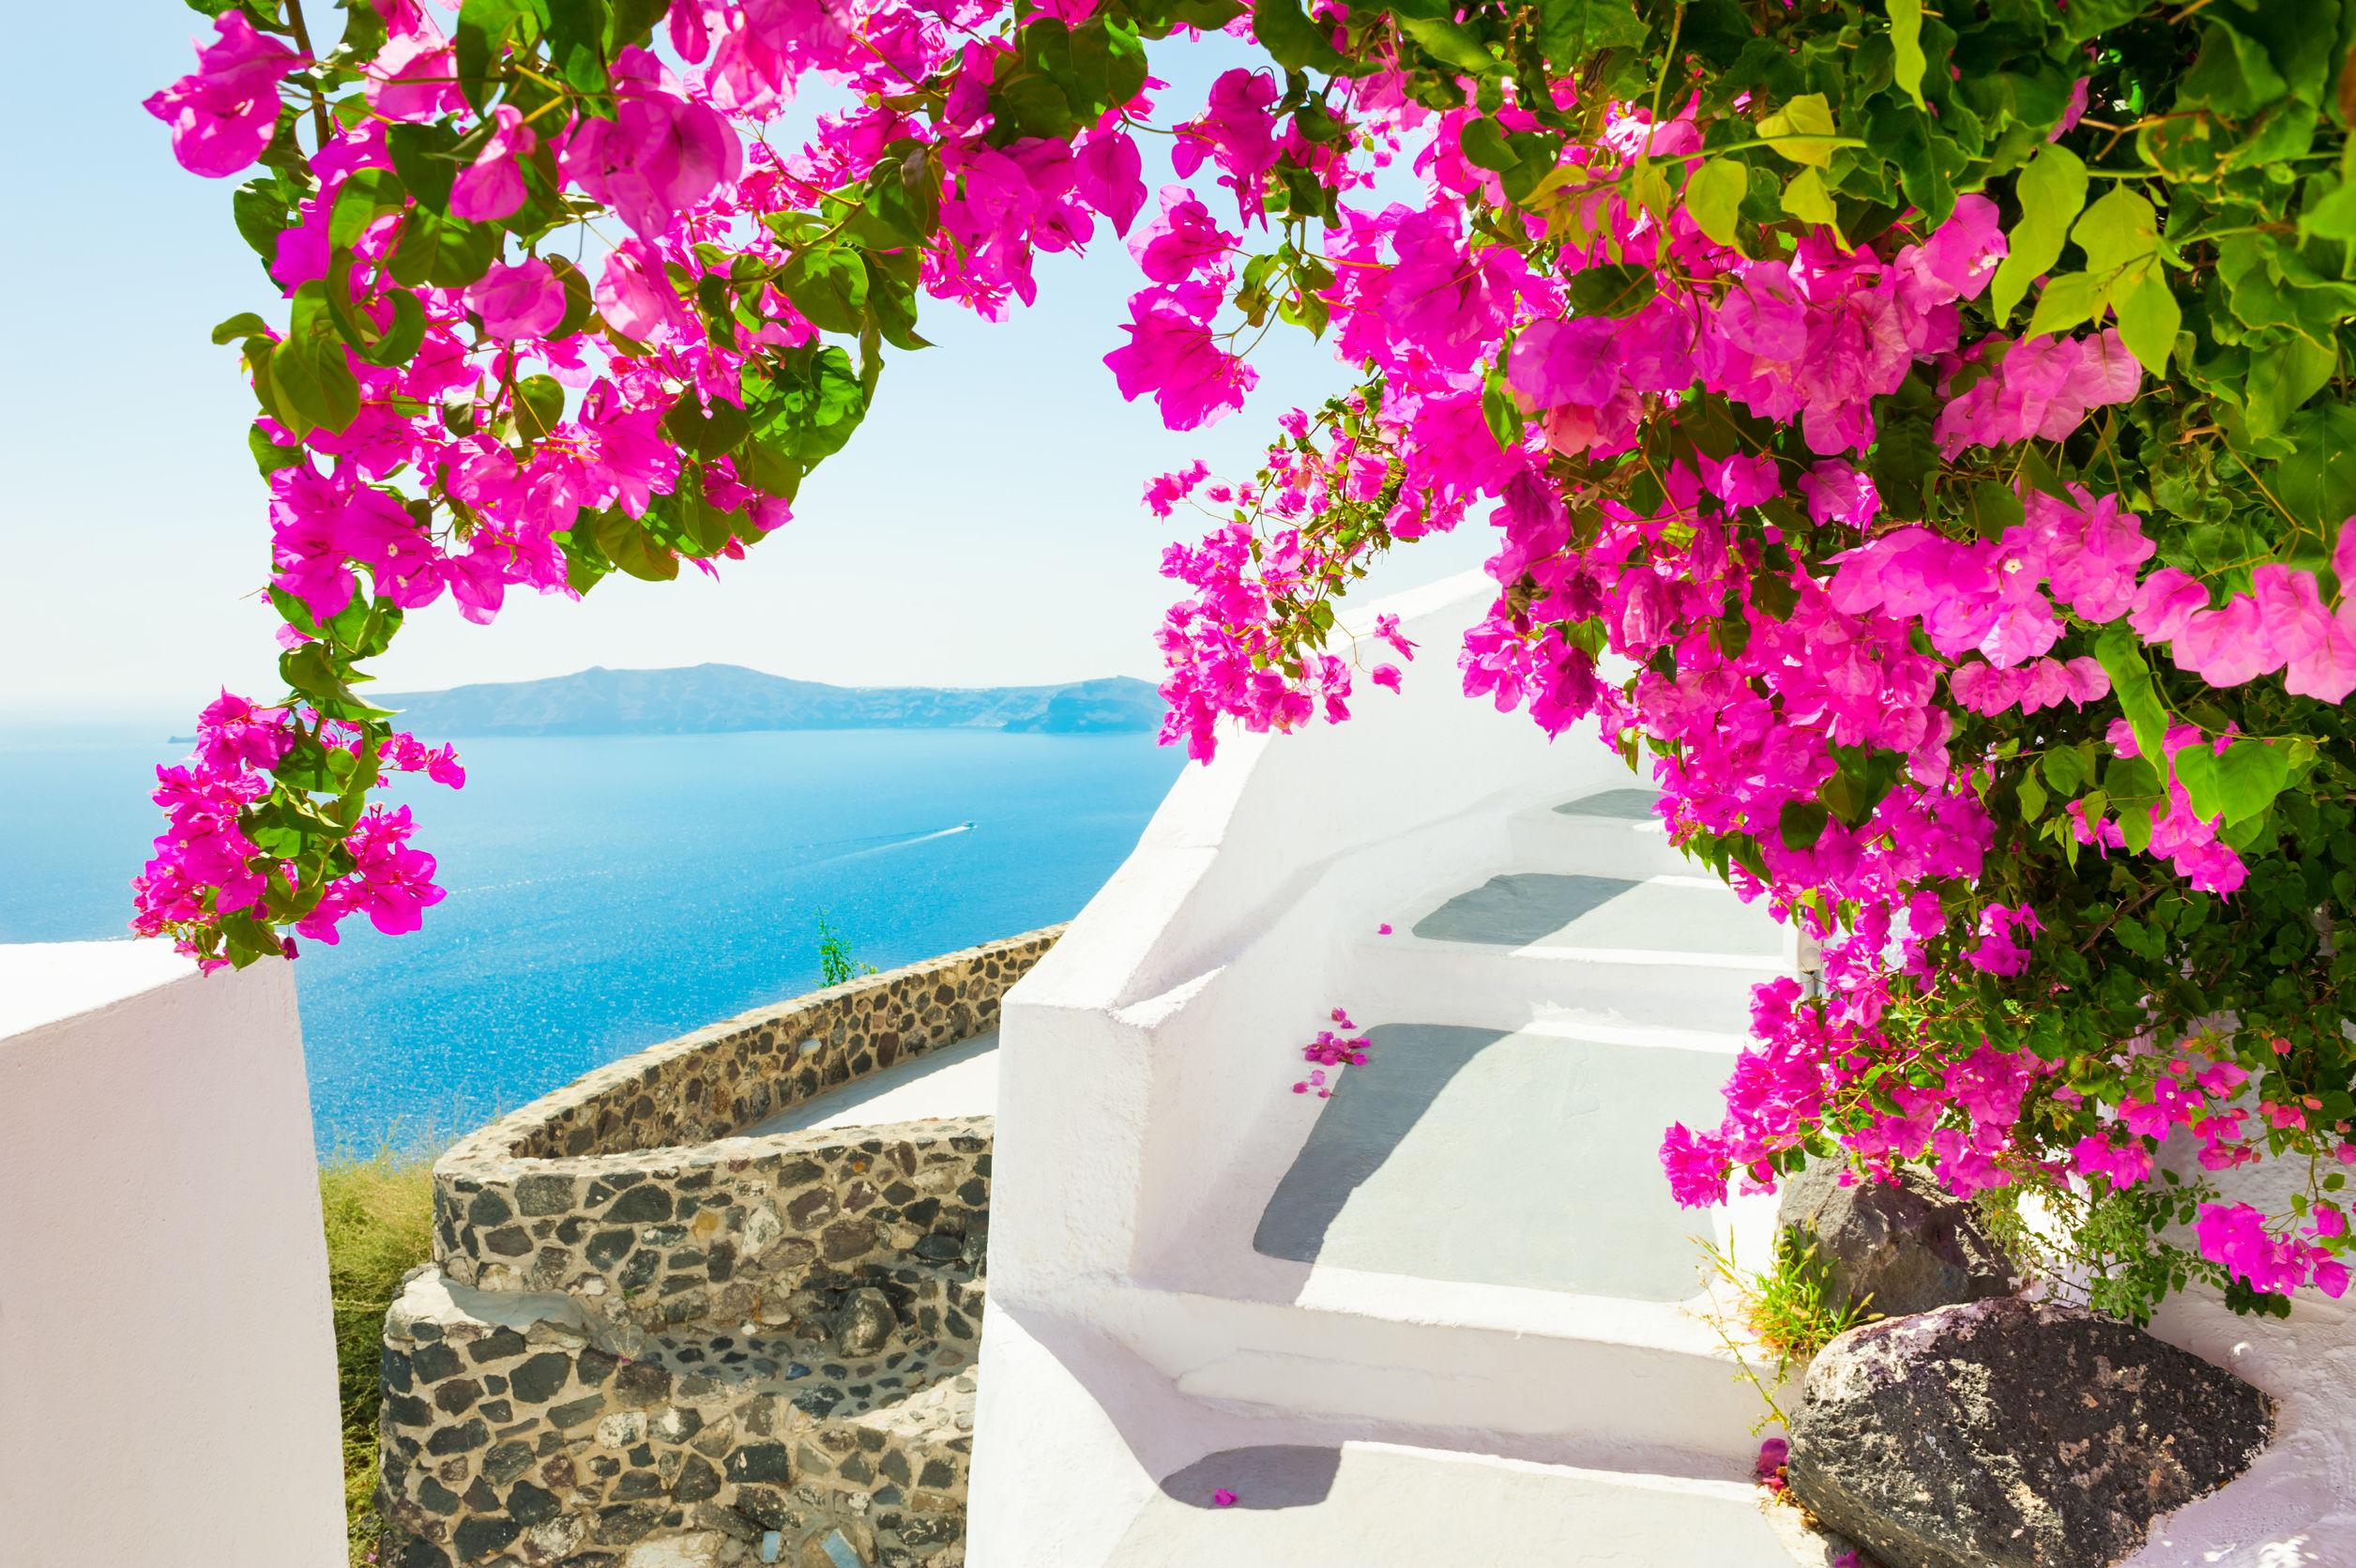 Beautiful terrace with pink flowers on Santorini island, Greece